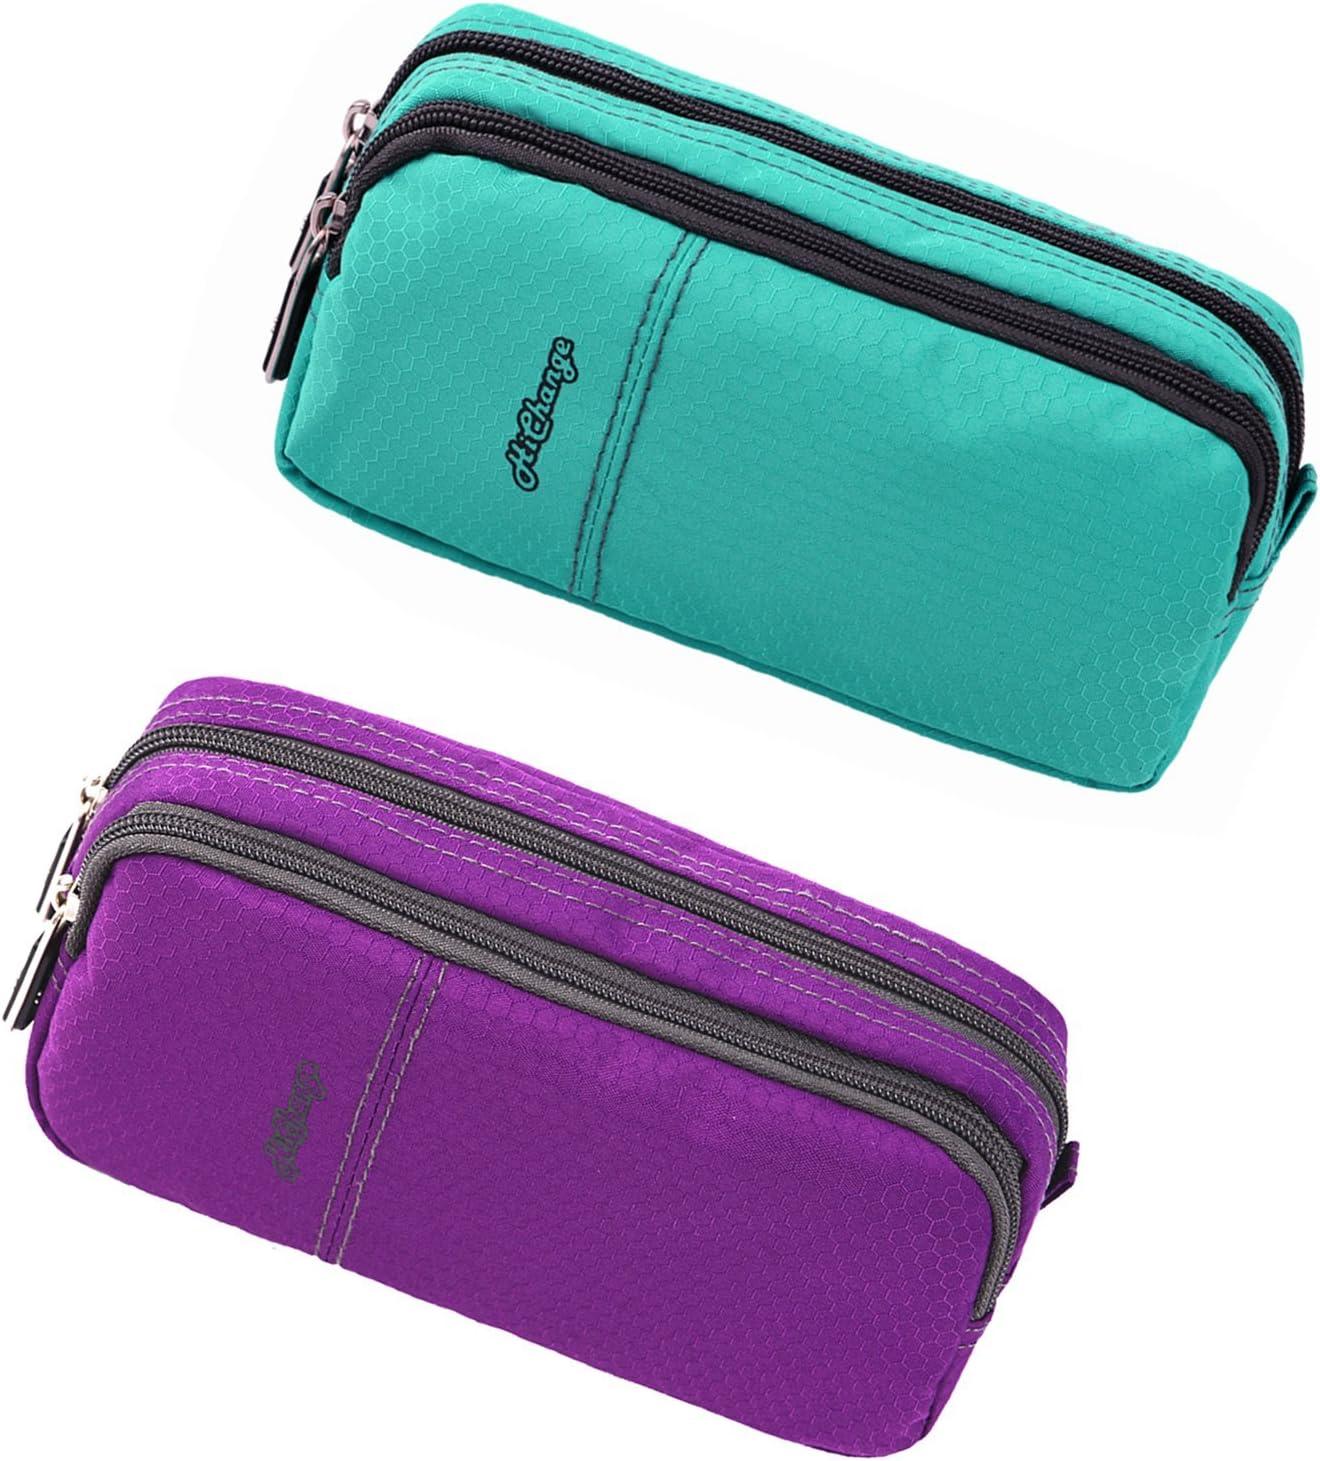 Pencil Case, Big Capacity Pen Case Desk Organizer with Zipper for School & Office Supplies (2Pack Green+Purple)